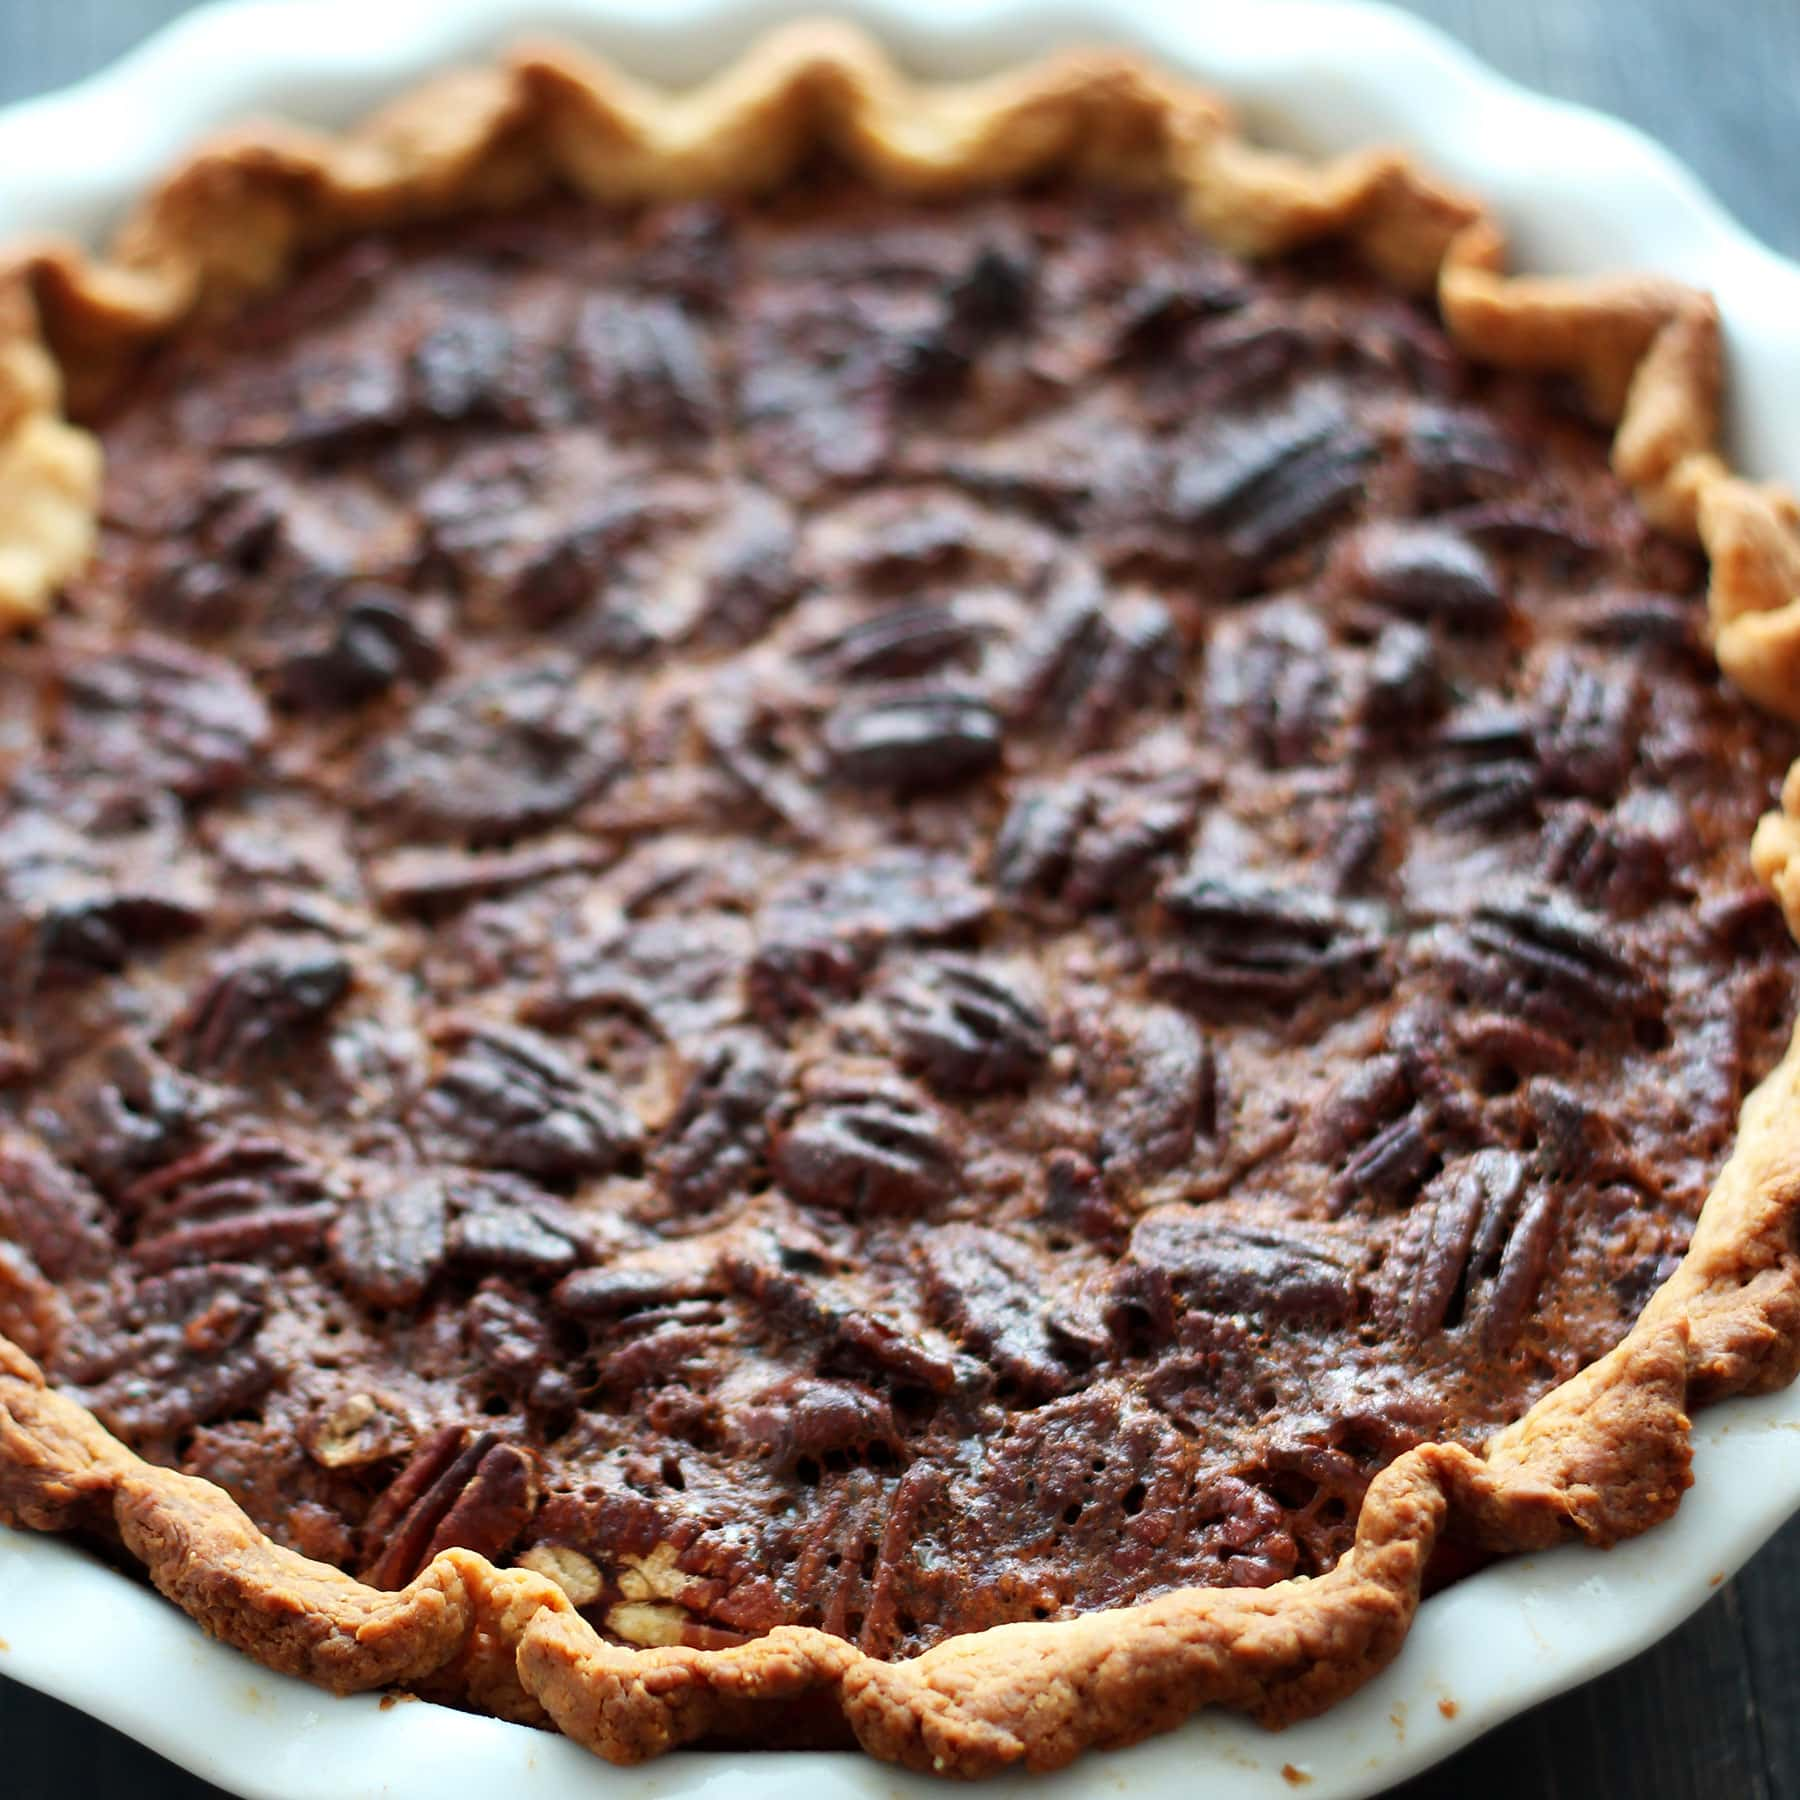 ... Chip Cookies Chocolate Chip Cookie Cheesecake Bars Chocolate Pecan Pie